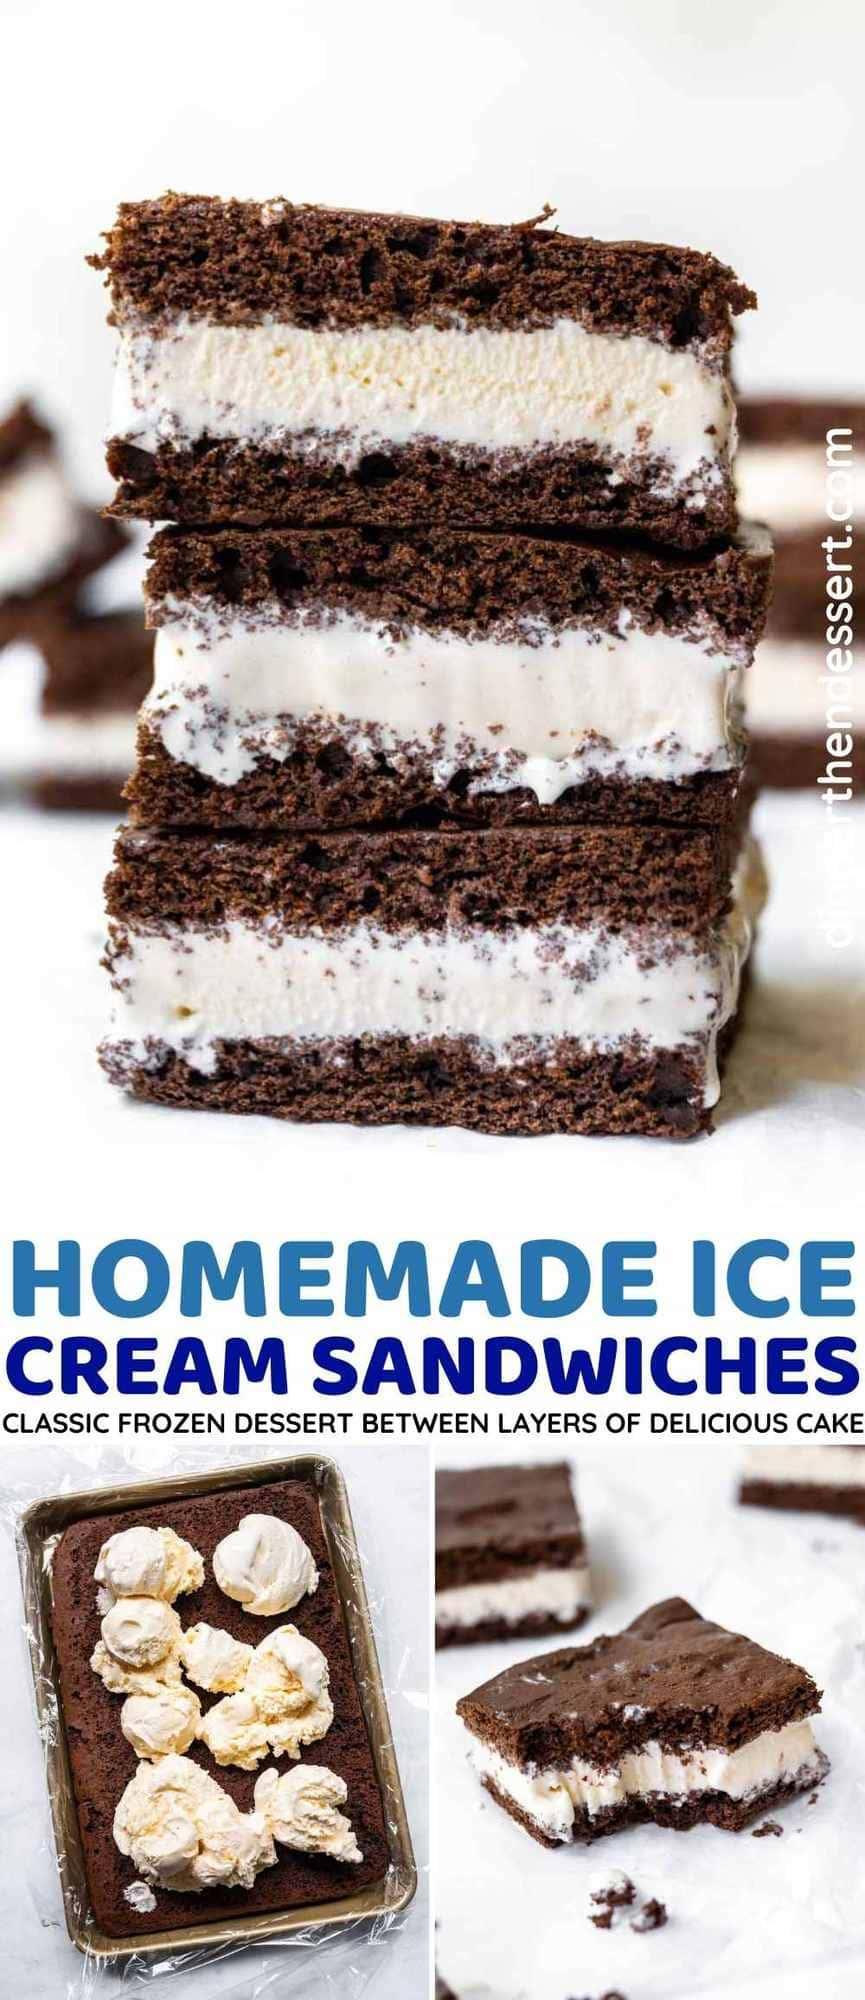 Ice Cream Sandwiches collage